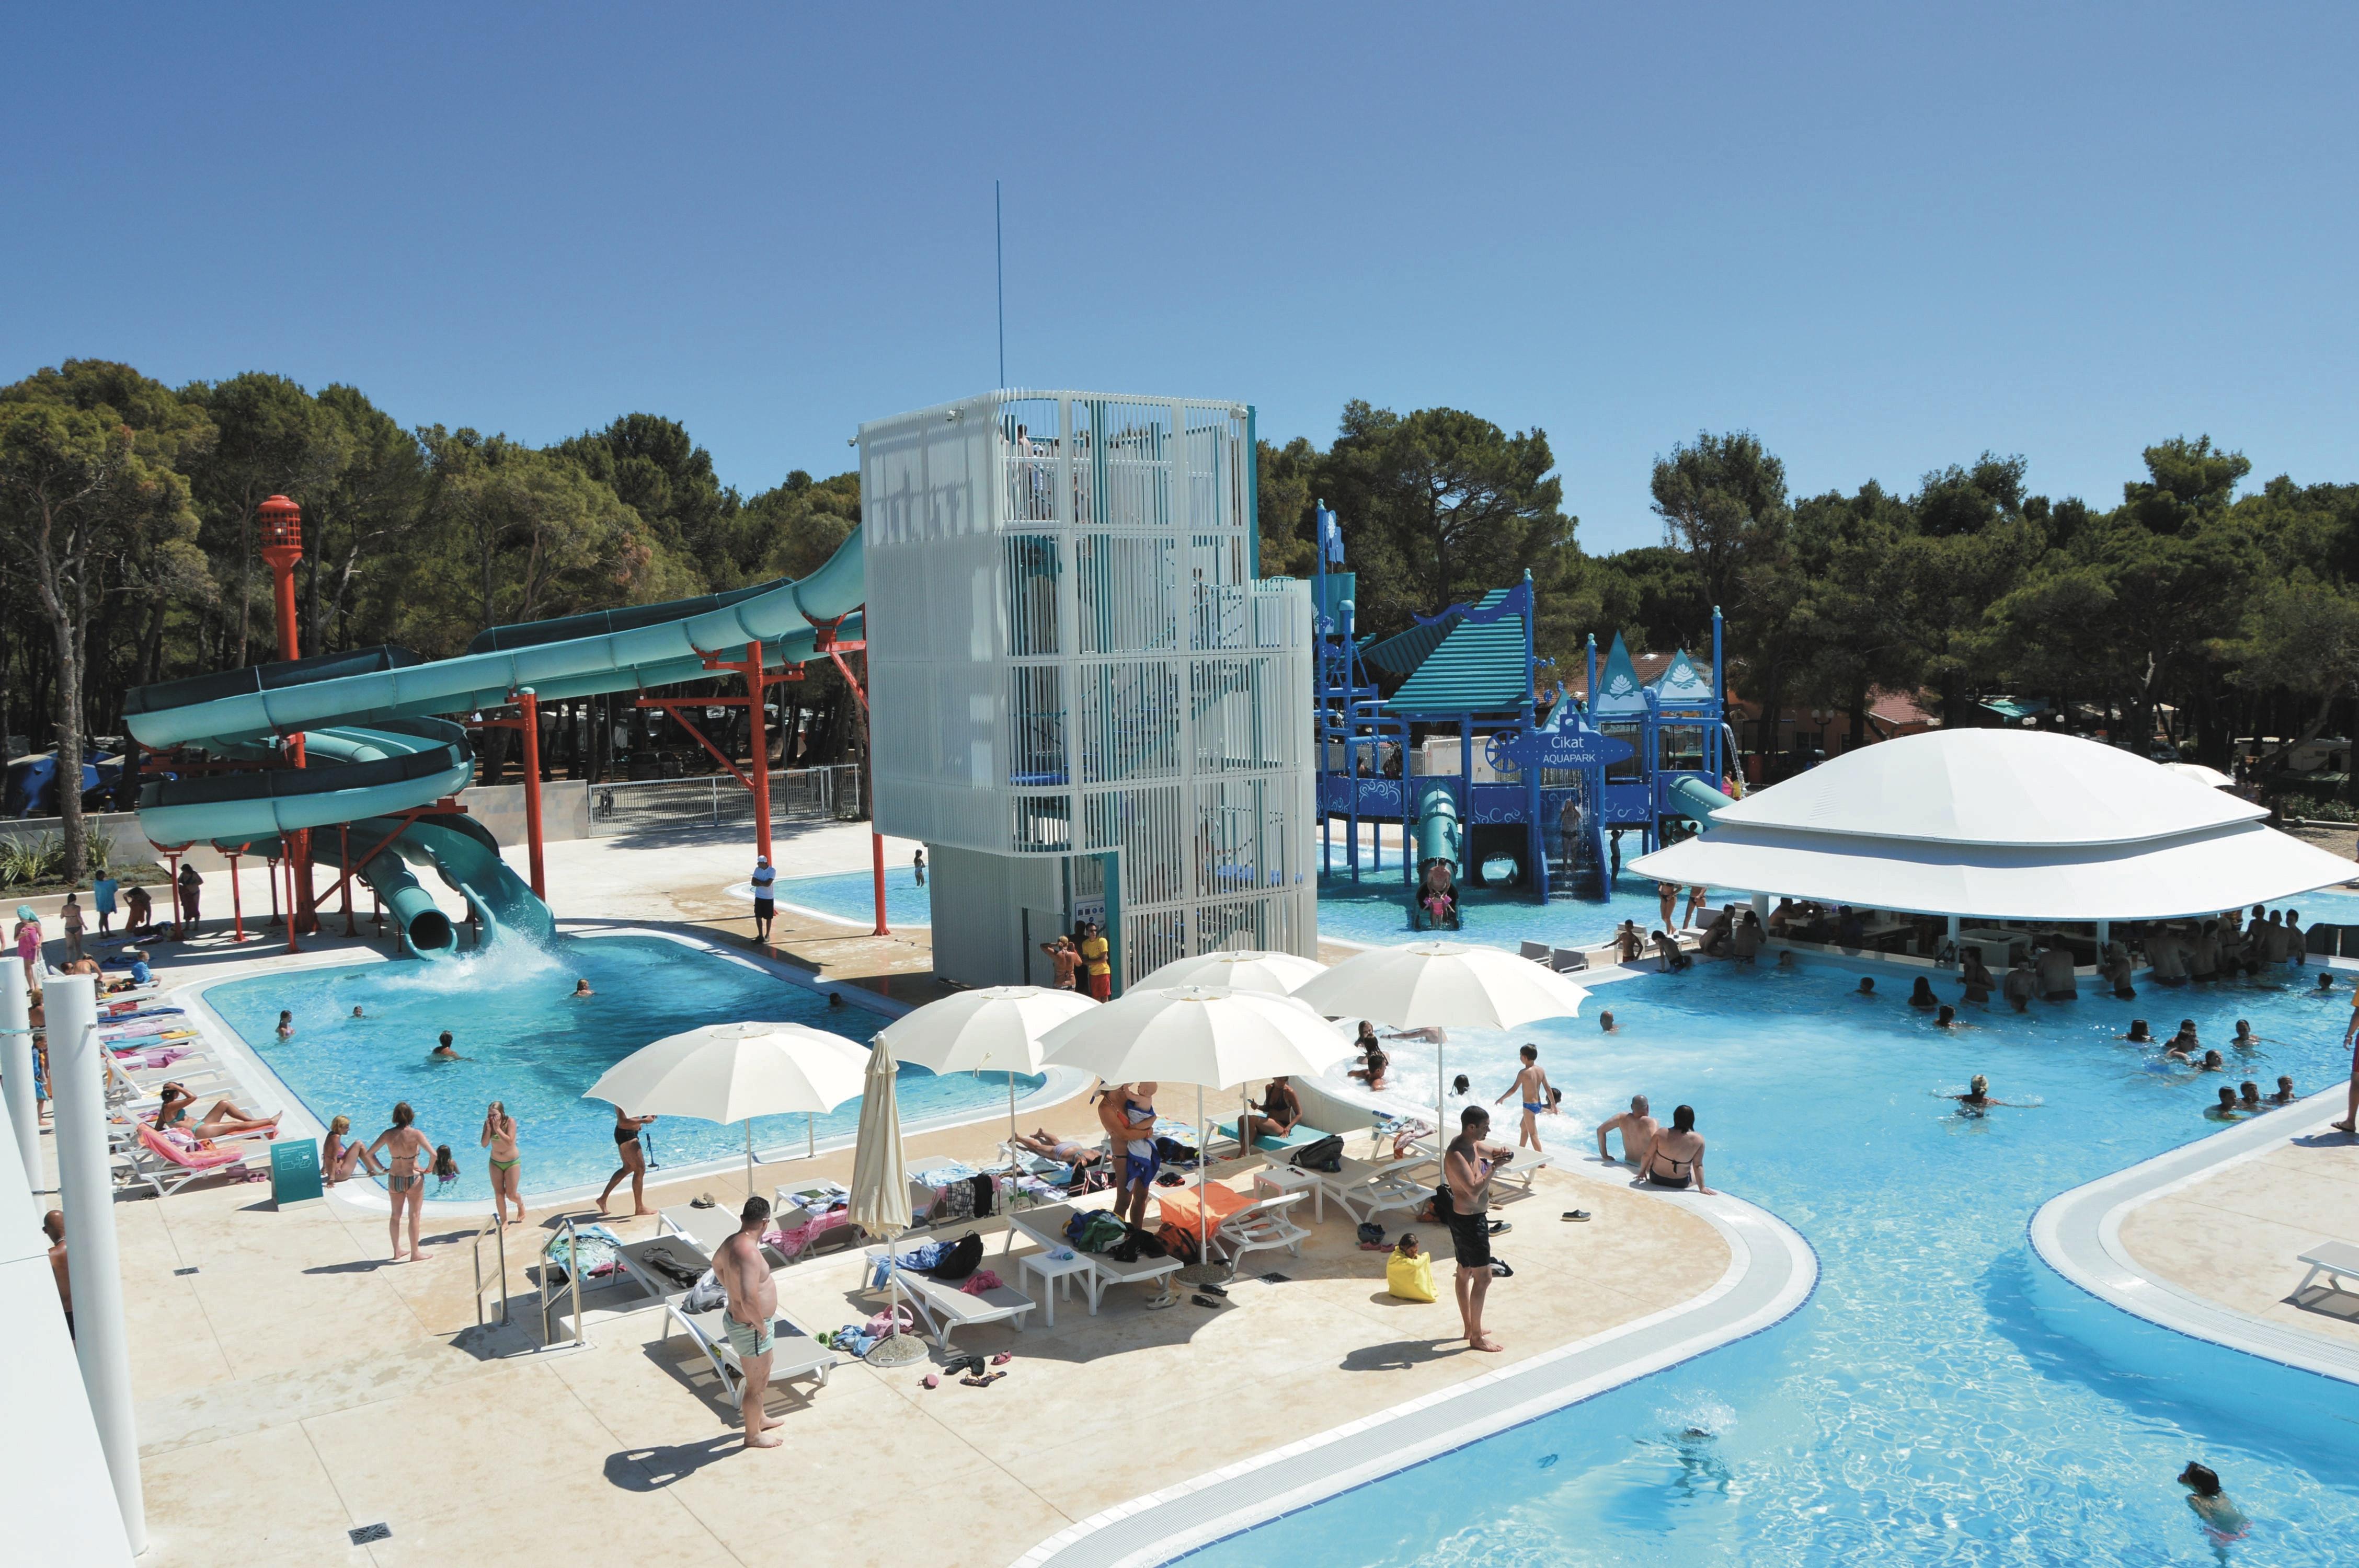 Camping Cikat zwembad roan go4camp